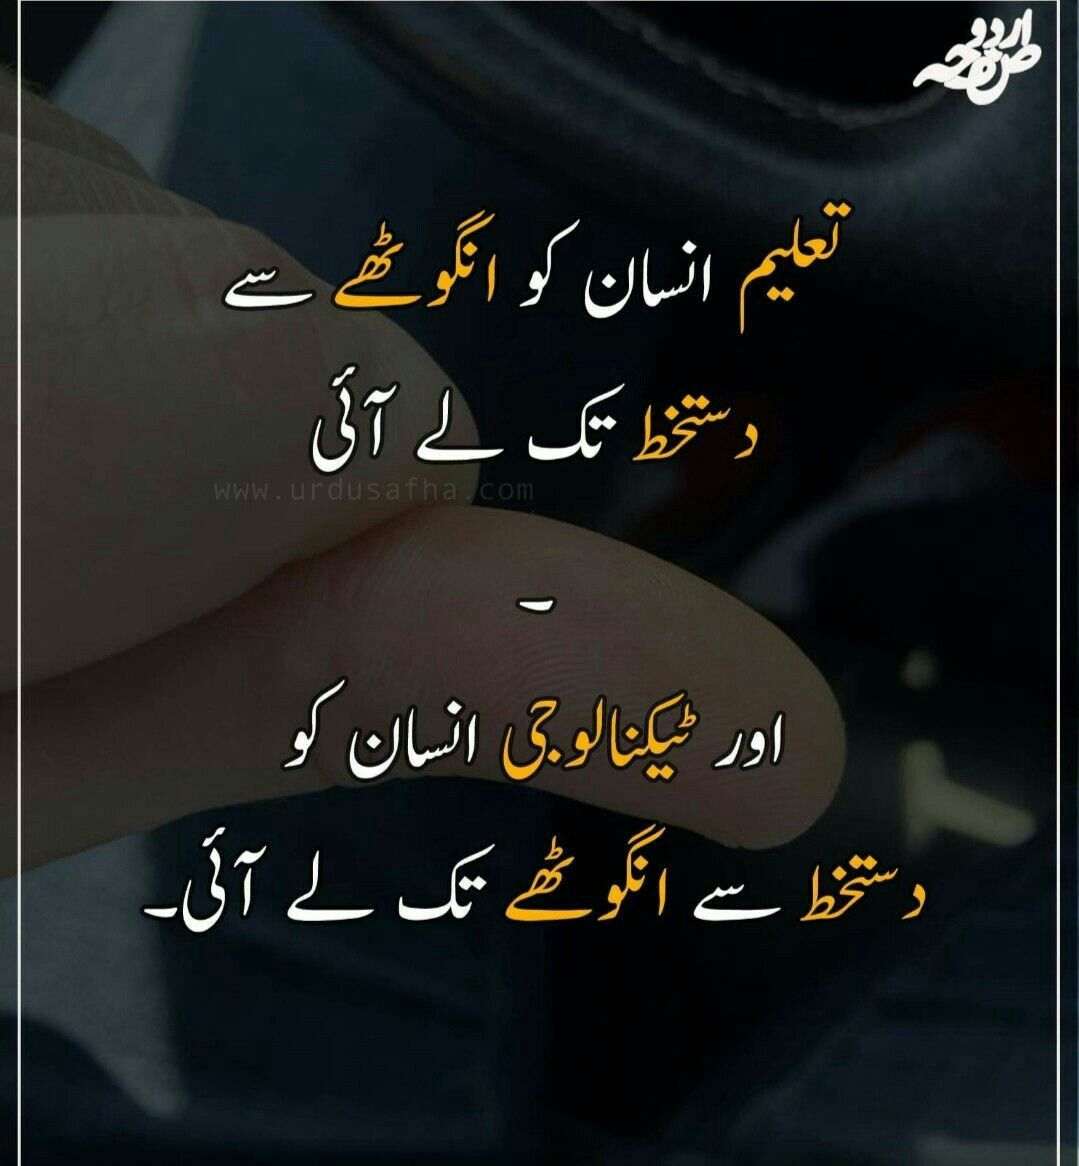 Bilkul Durust Urdu Funny Quotes Funny Quotes In Urdu Urdu Words